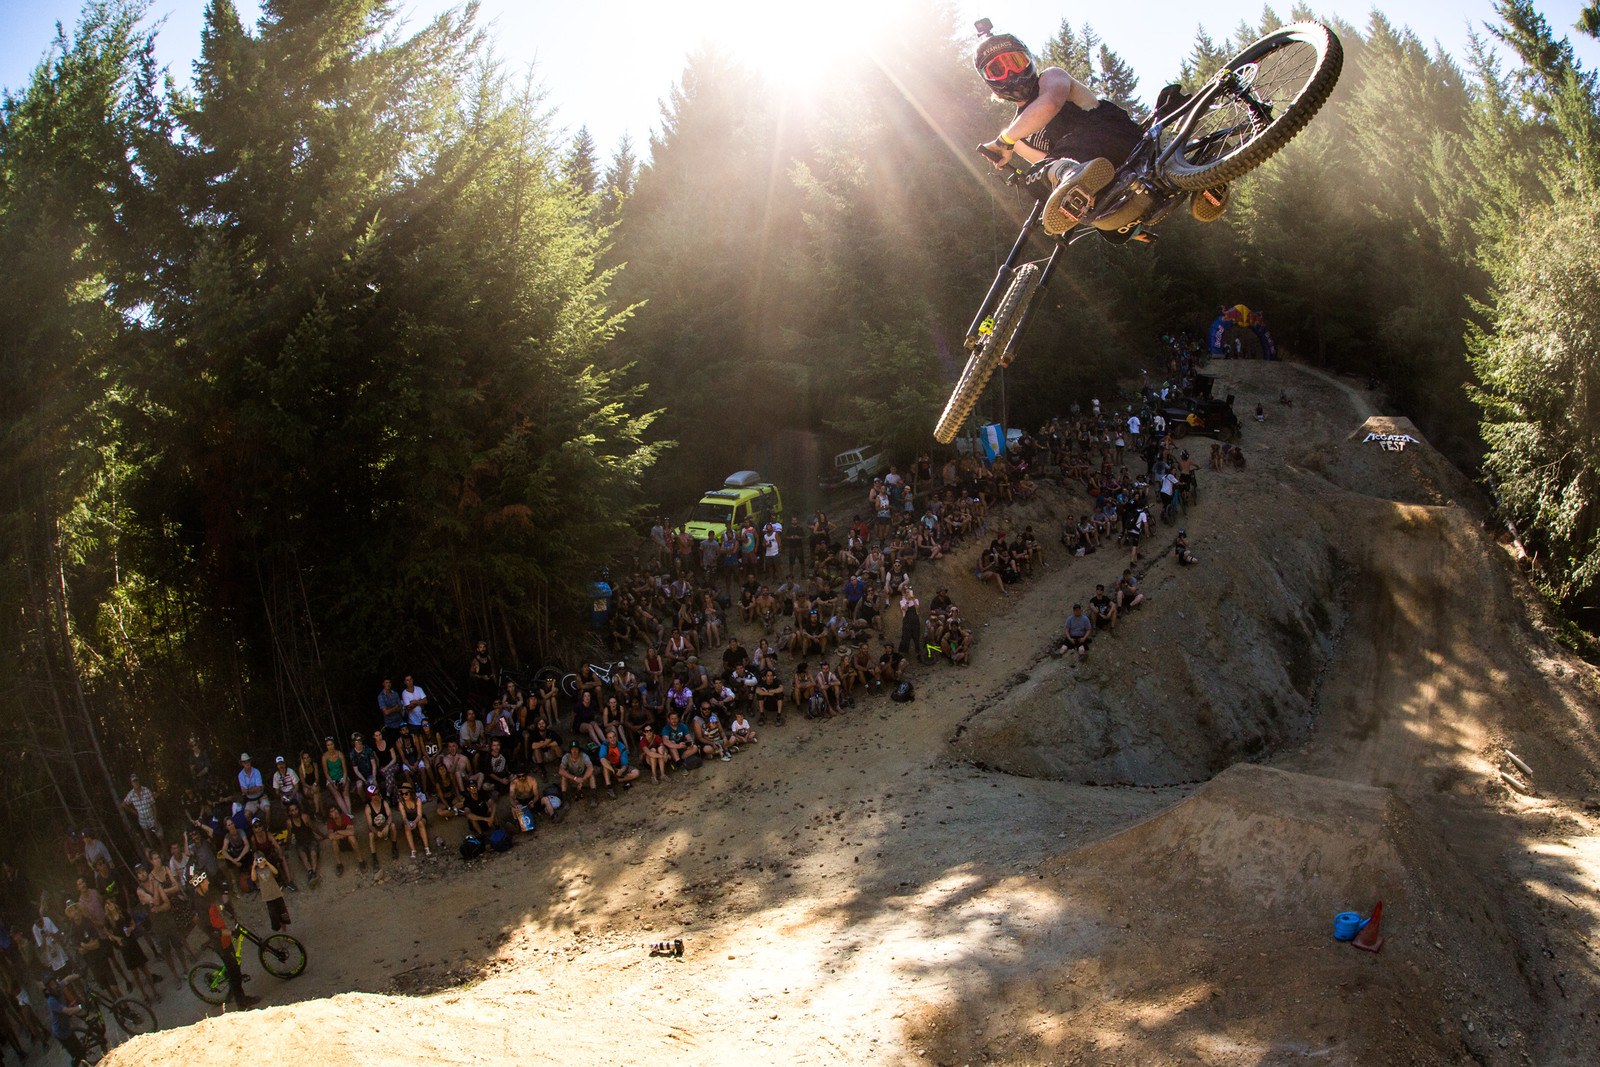 Blasting for McGarry, Joel Tunbridge - McGazza Fest Dream Track Jam - Mountain Biking Pictures - Vital MTB